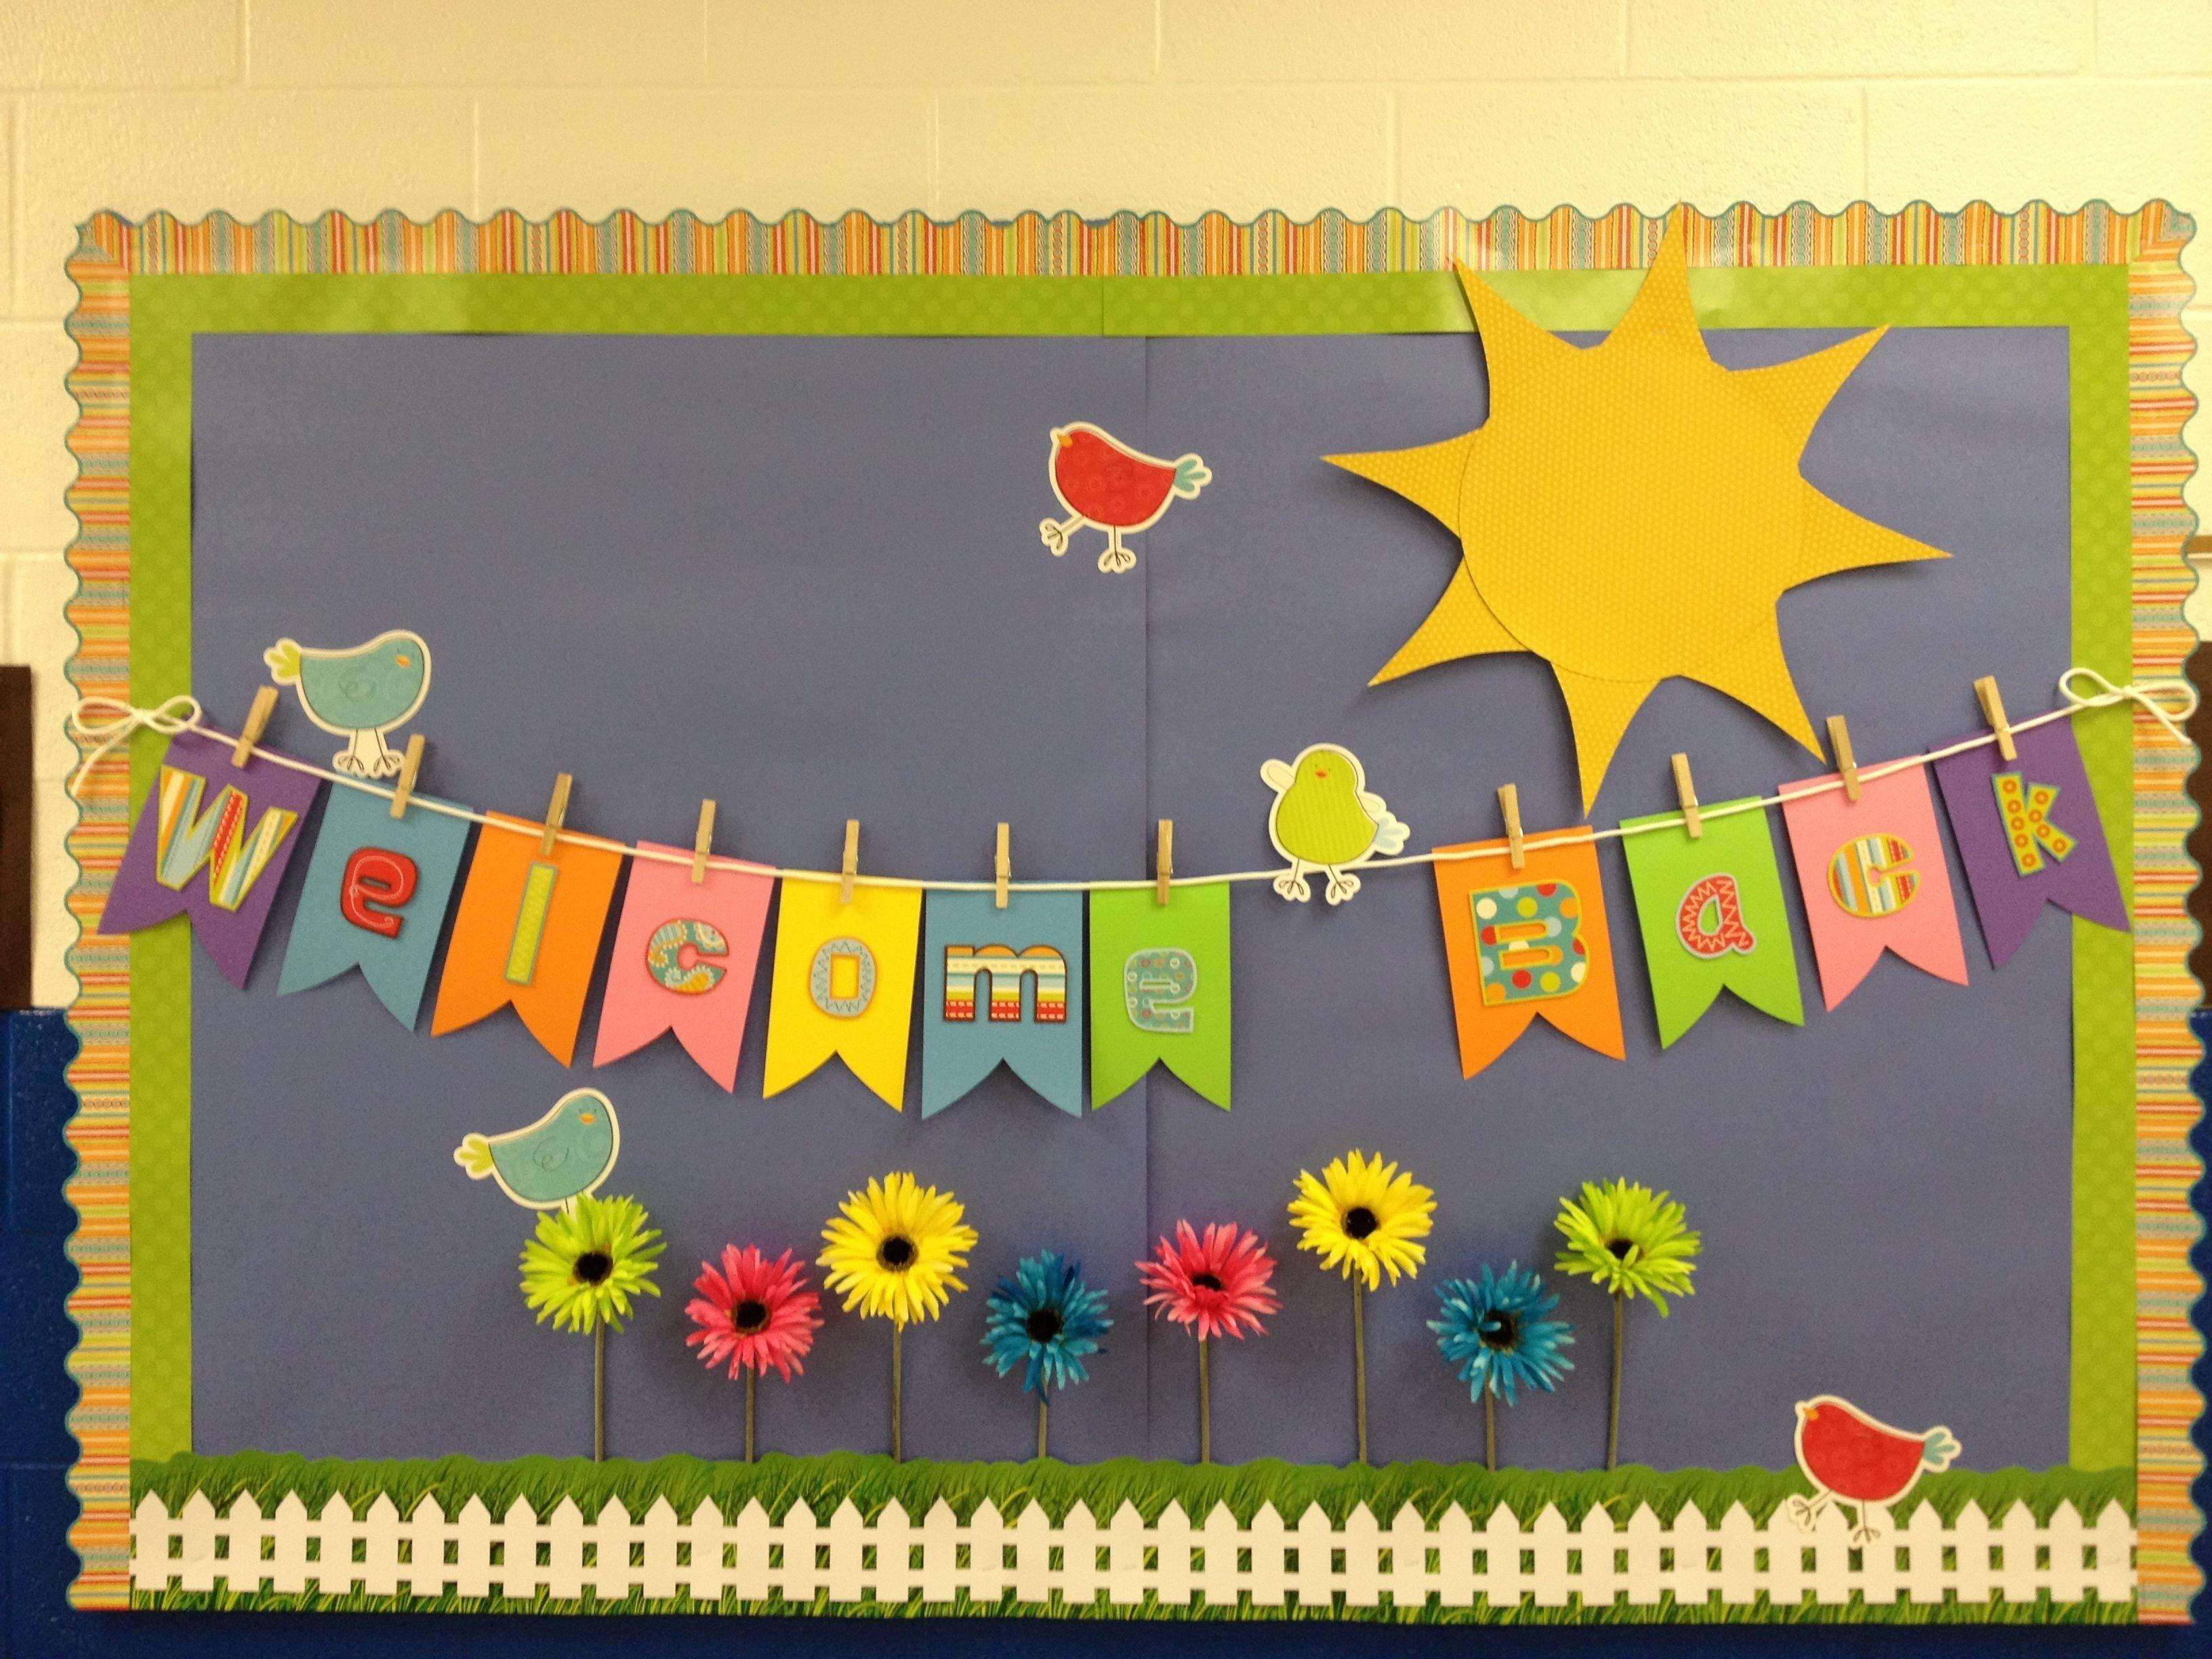 10 Wonderful Beginning Of The Year Bulletin Board Ideas spring theme welcome back to school bulletin boards ideas bing 9 2021